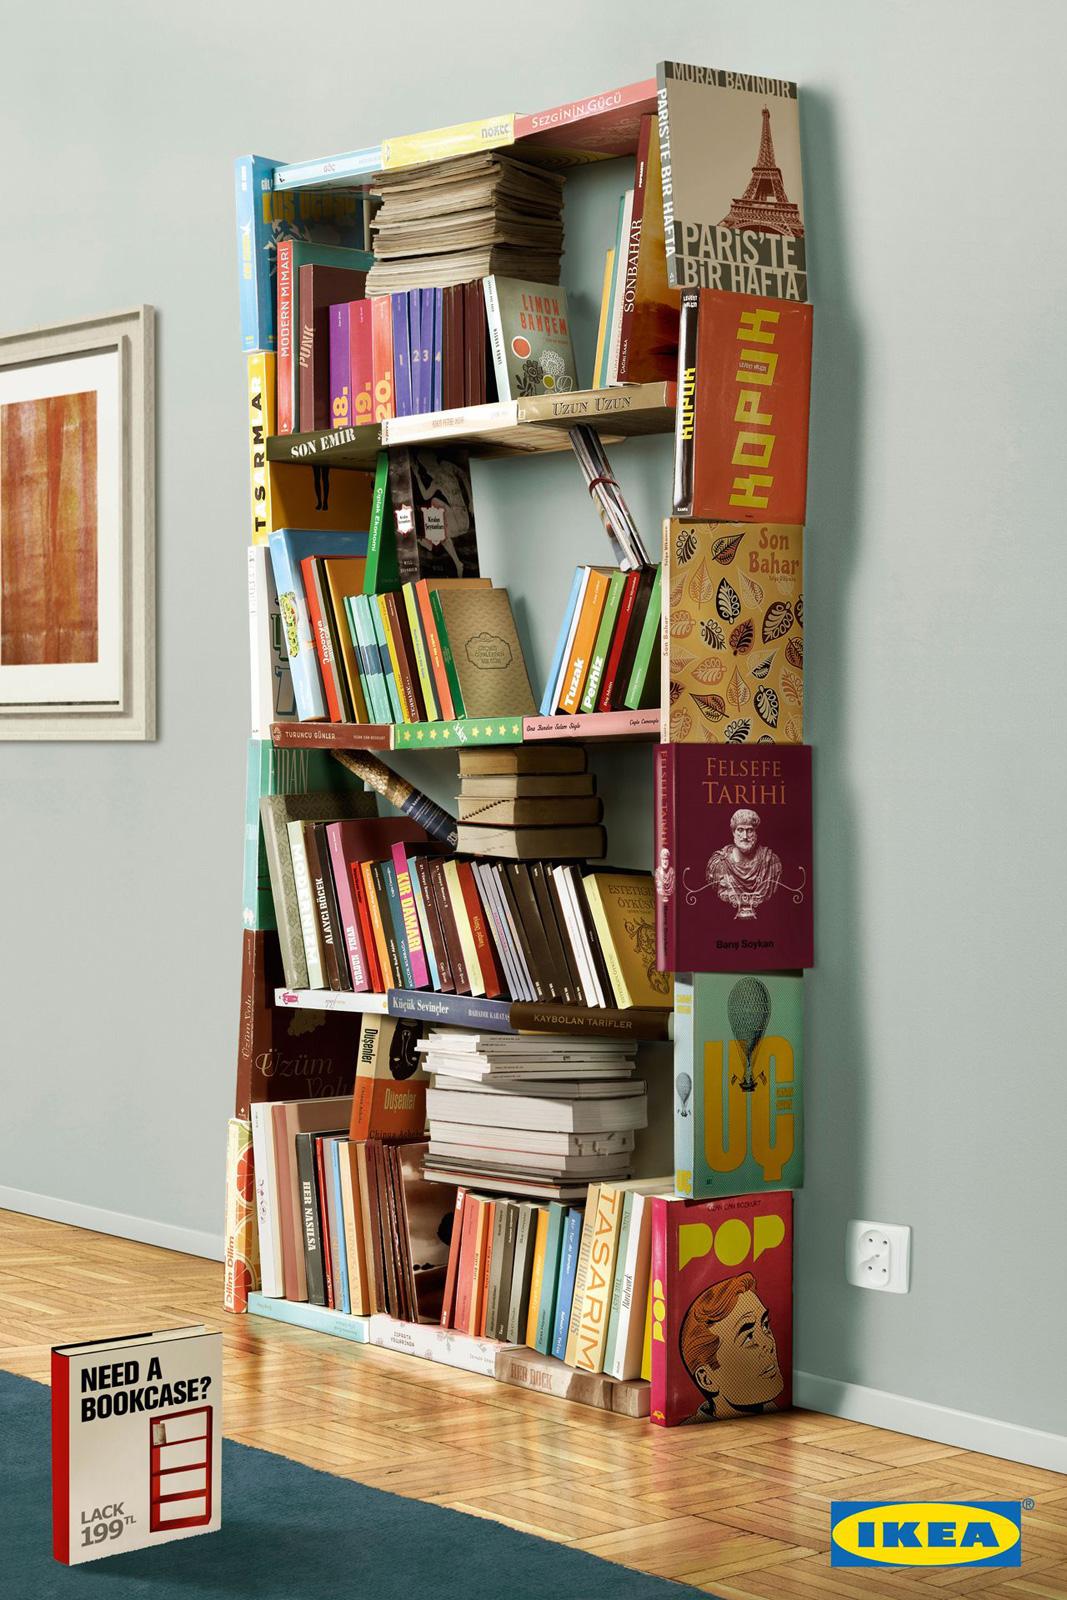 Decoracion mueble sofa estanteria libros ikea for Estanterias para libros